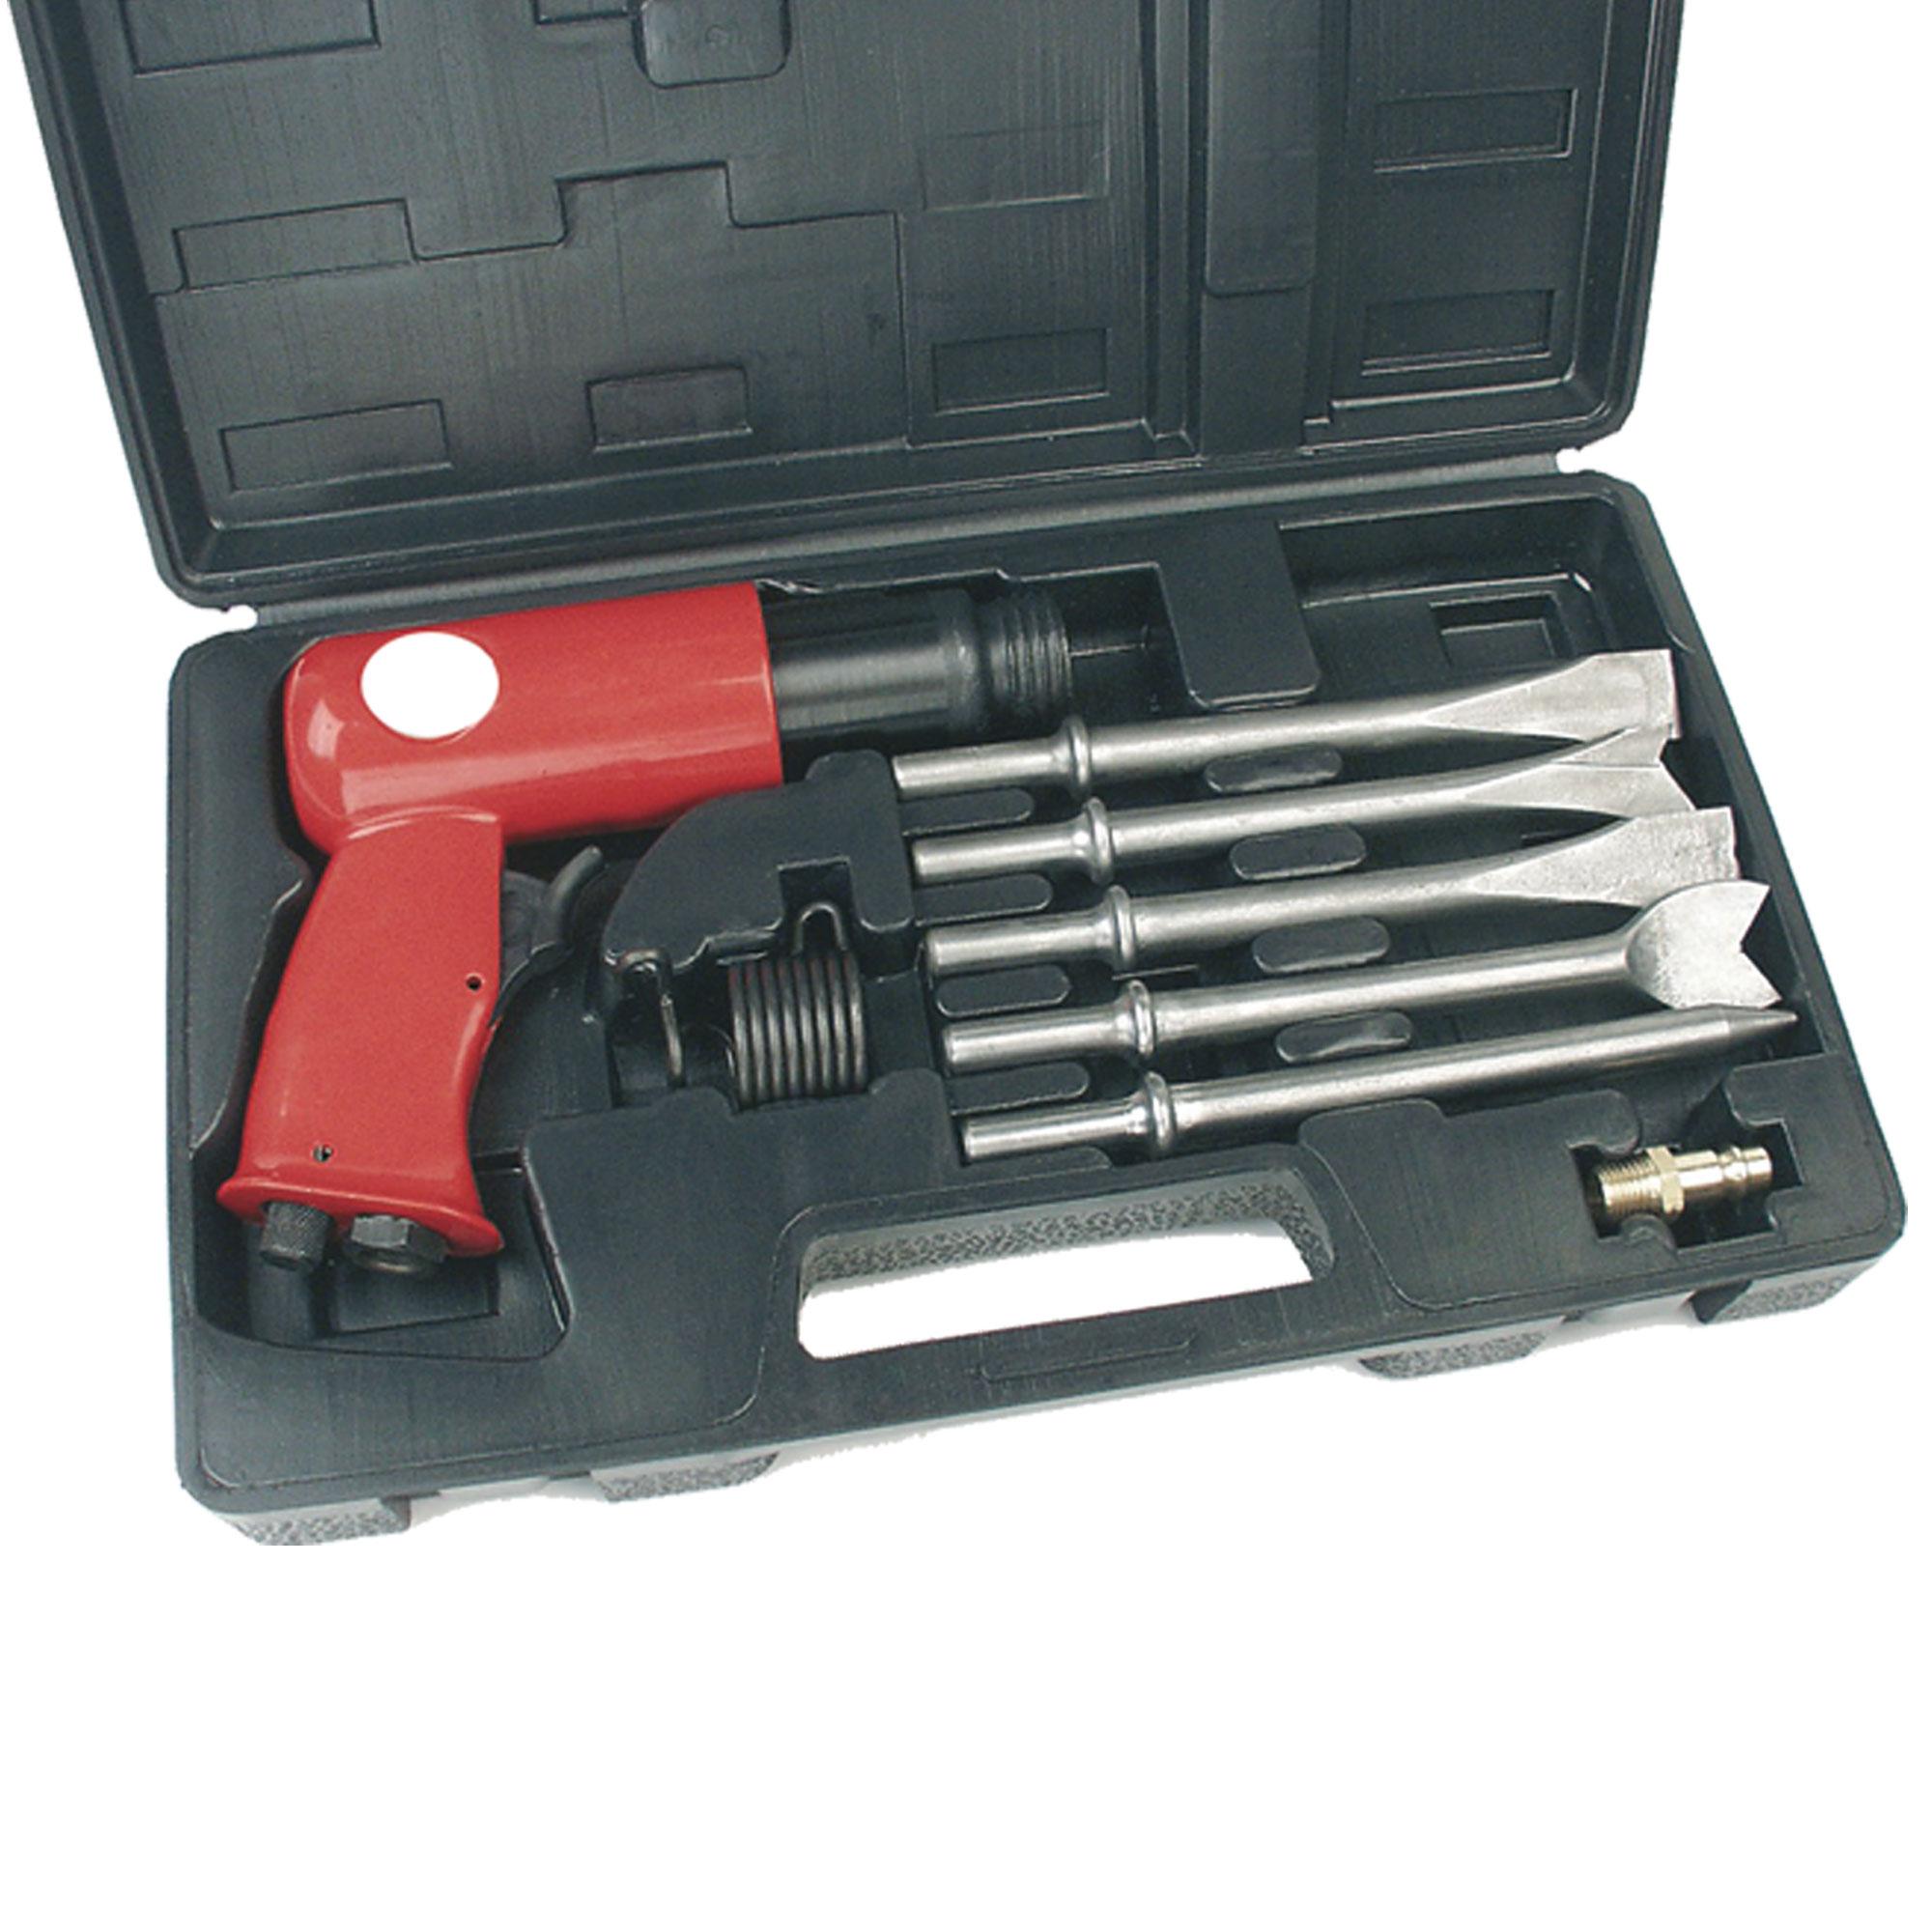 Druckluft-Meißelhammer-Set DMH 250/1